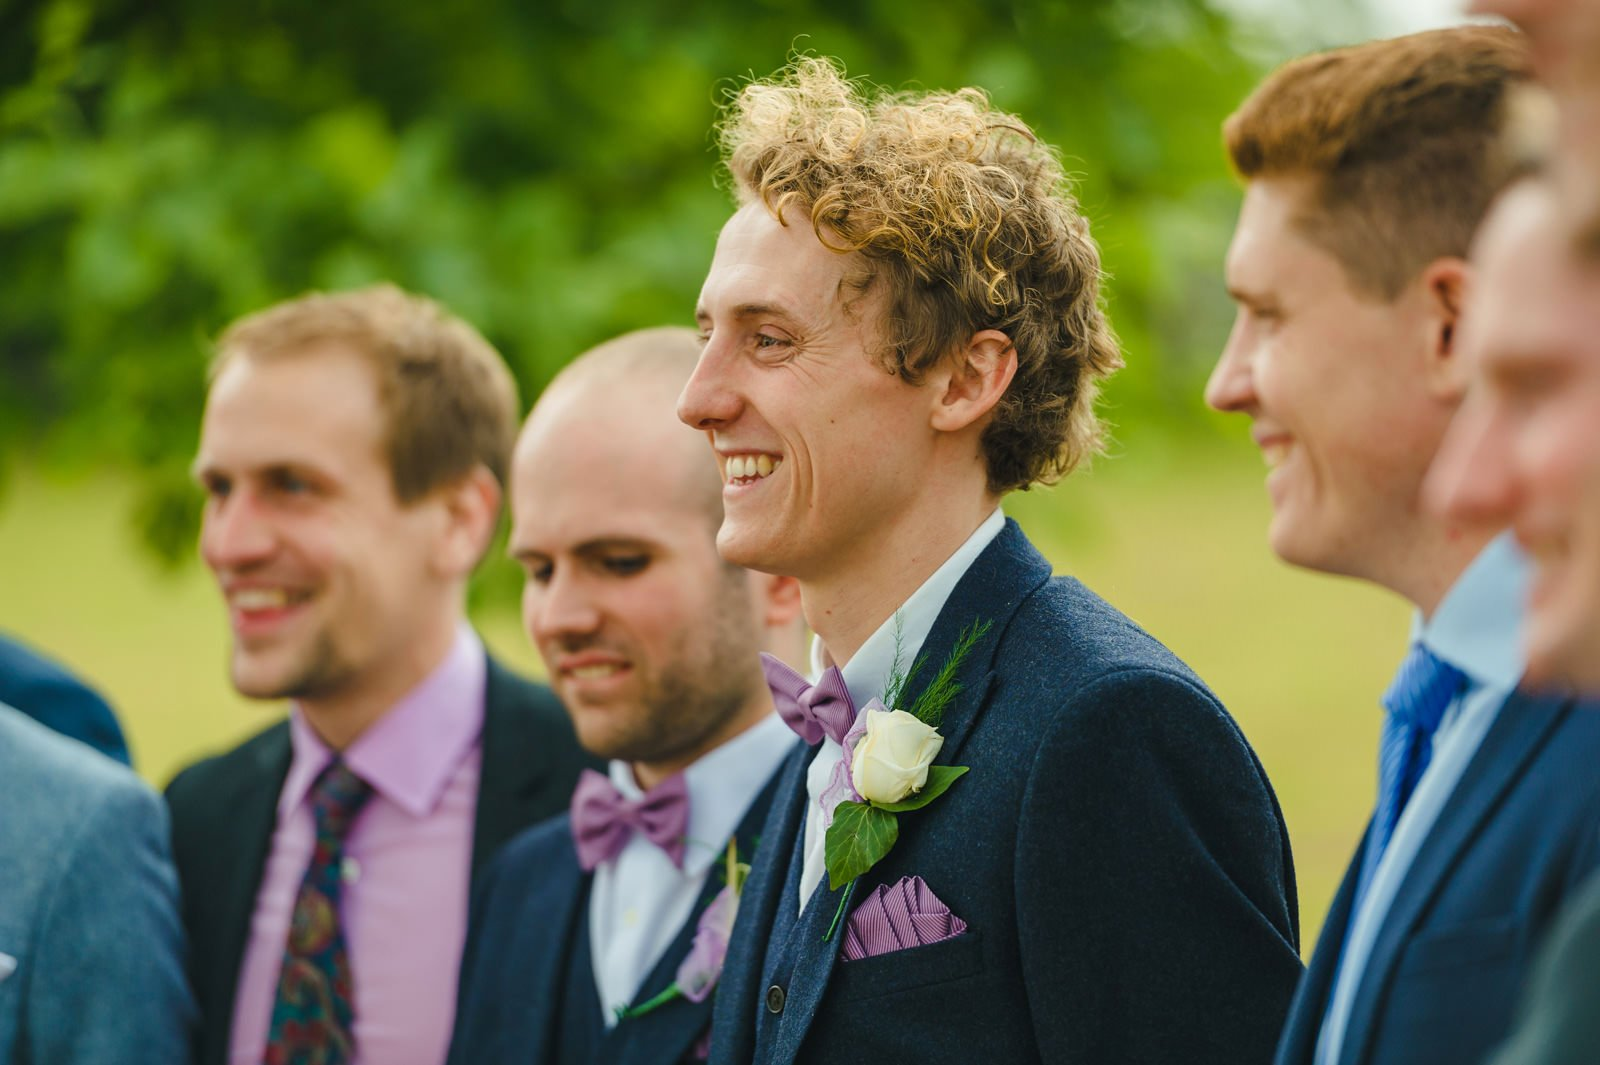 Millers Of Netley wedding, Dorrington, Shrewsbury | Emma + Ben 60